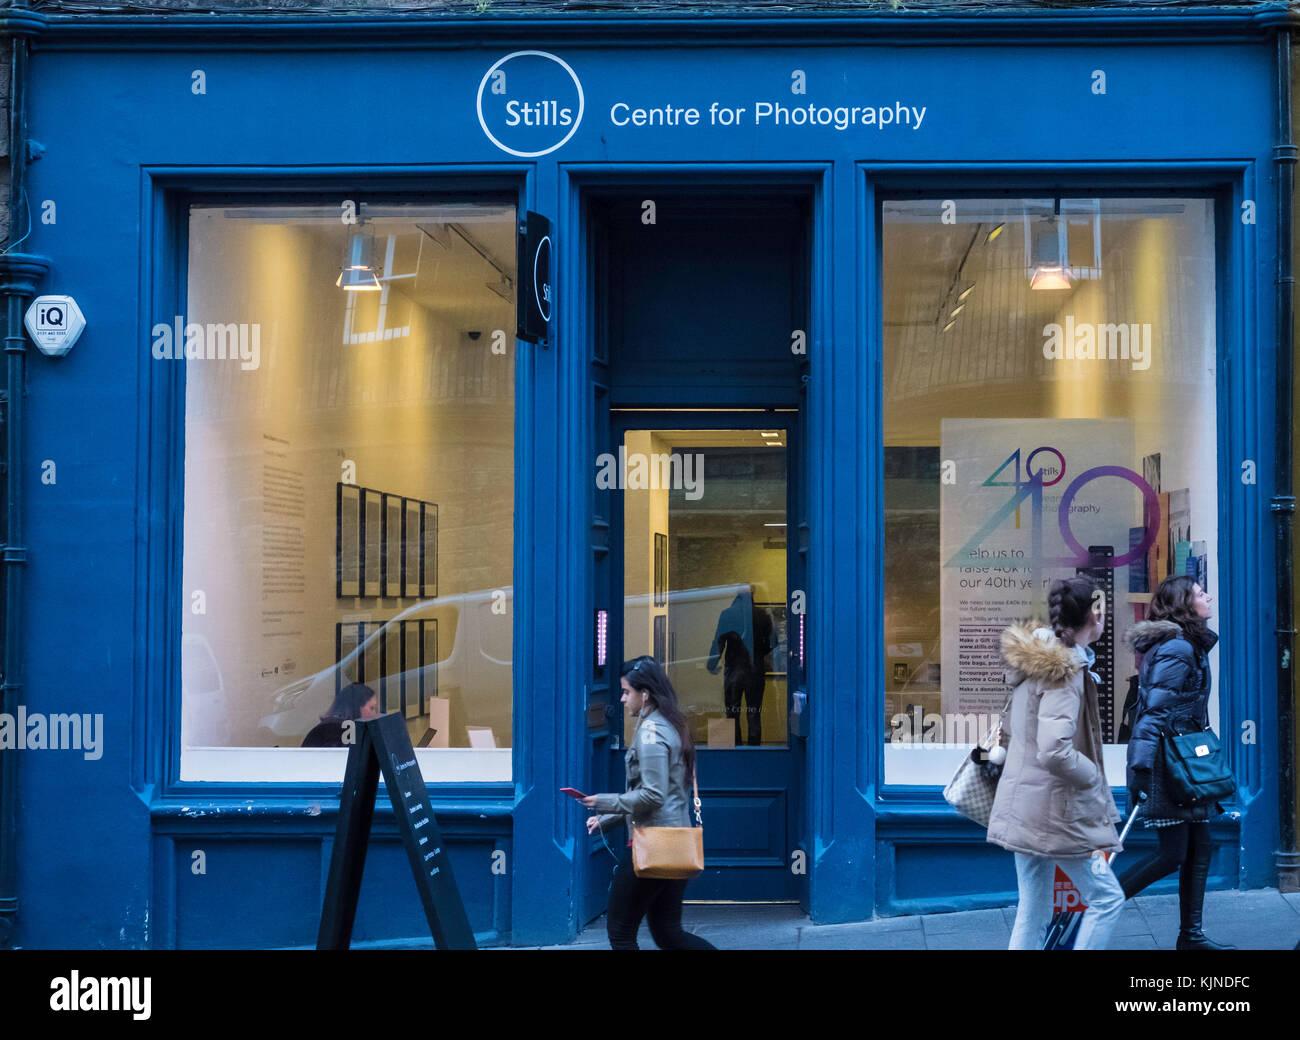 Exterior of Stills Centre for Photography on Cockburn Street in Edinburgh Old Town, Scotland, united Kingdom - Stock Image